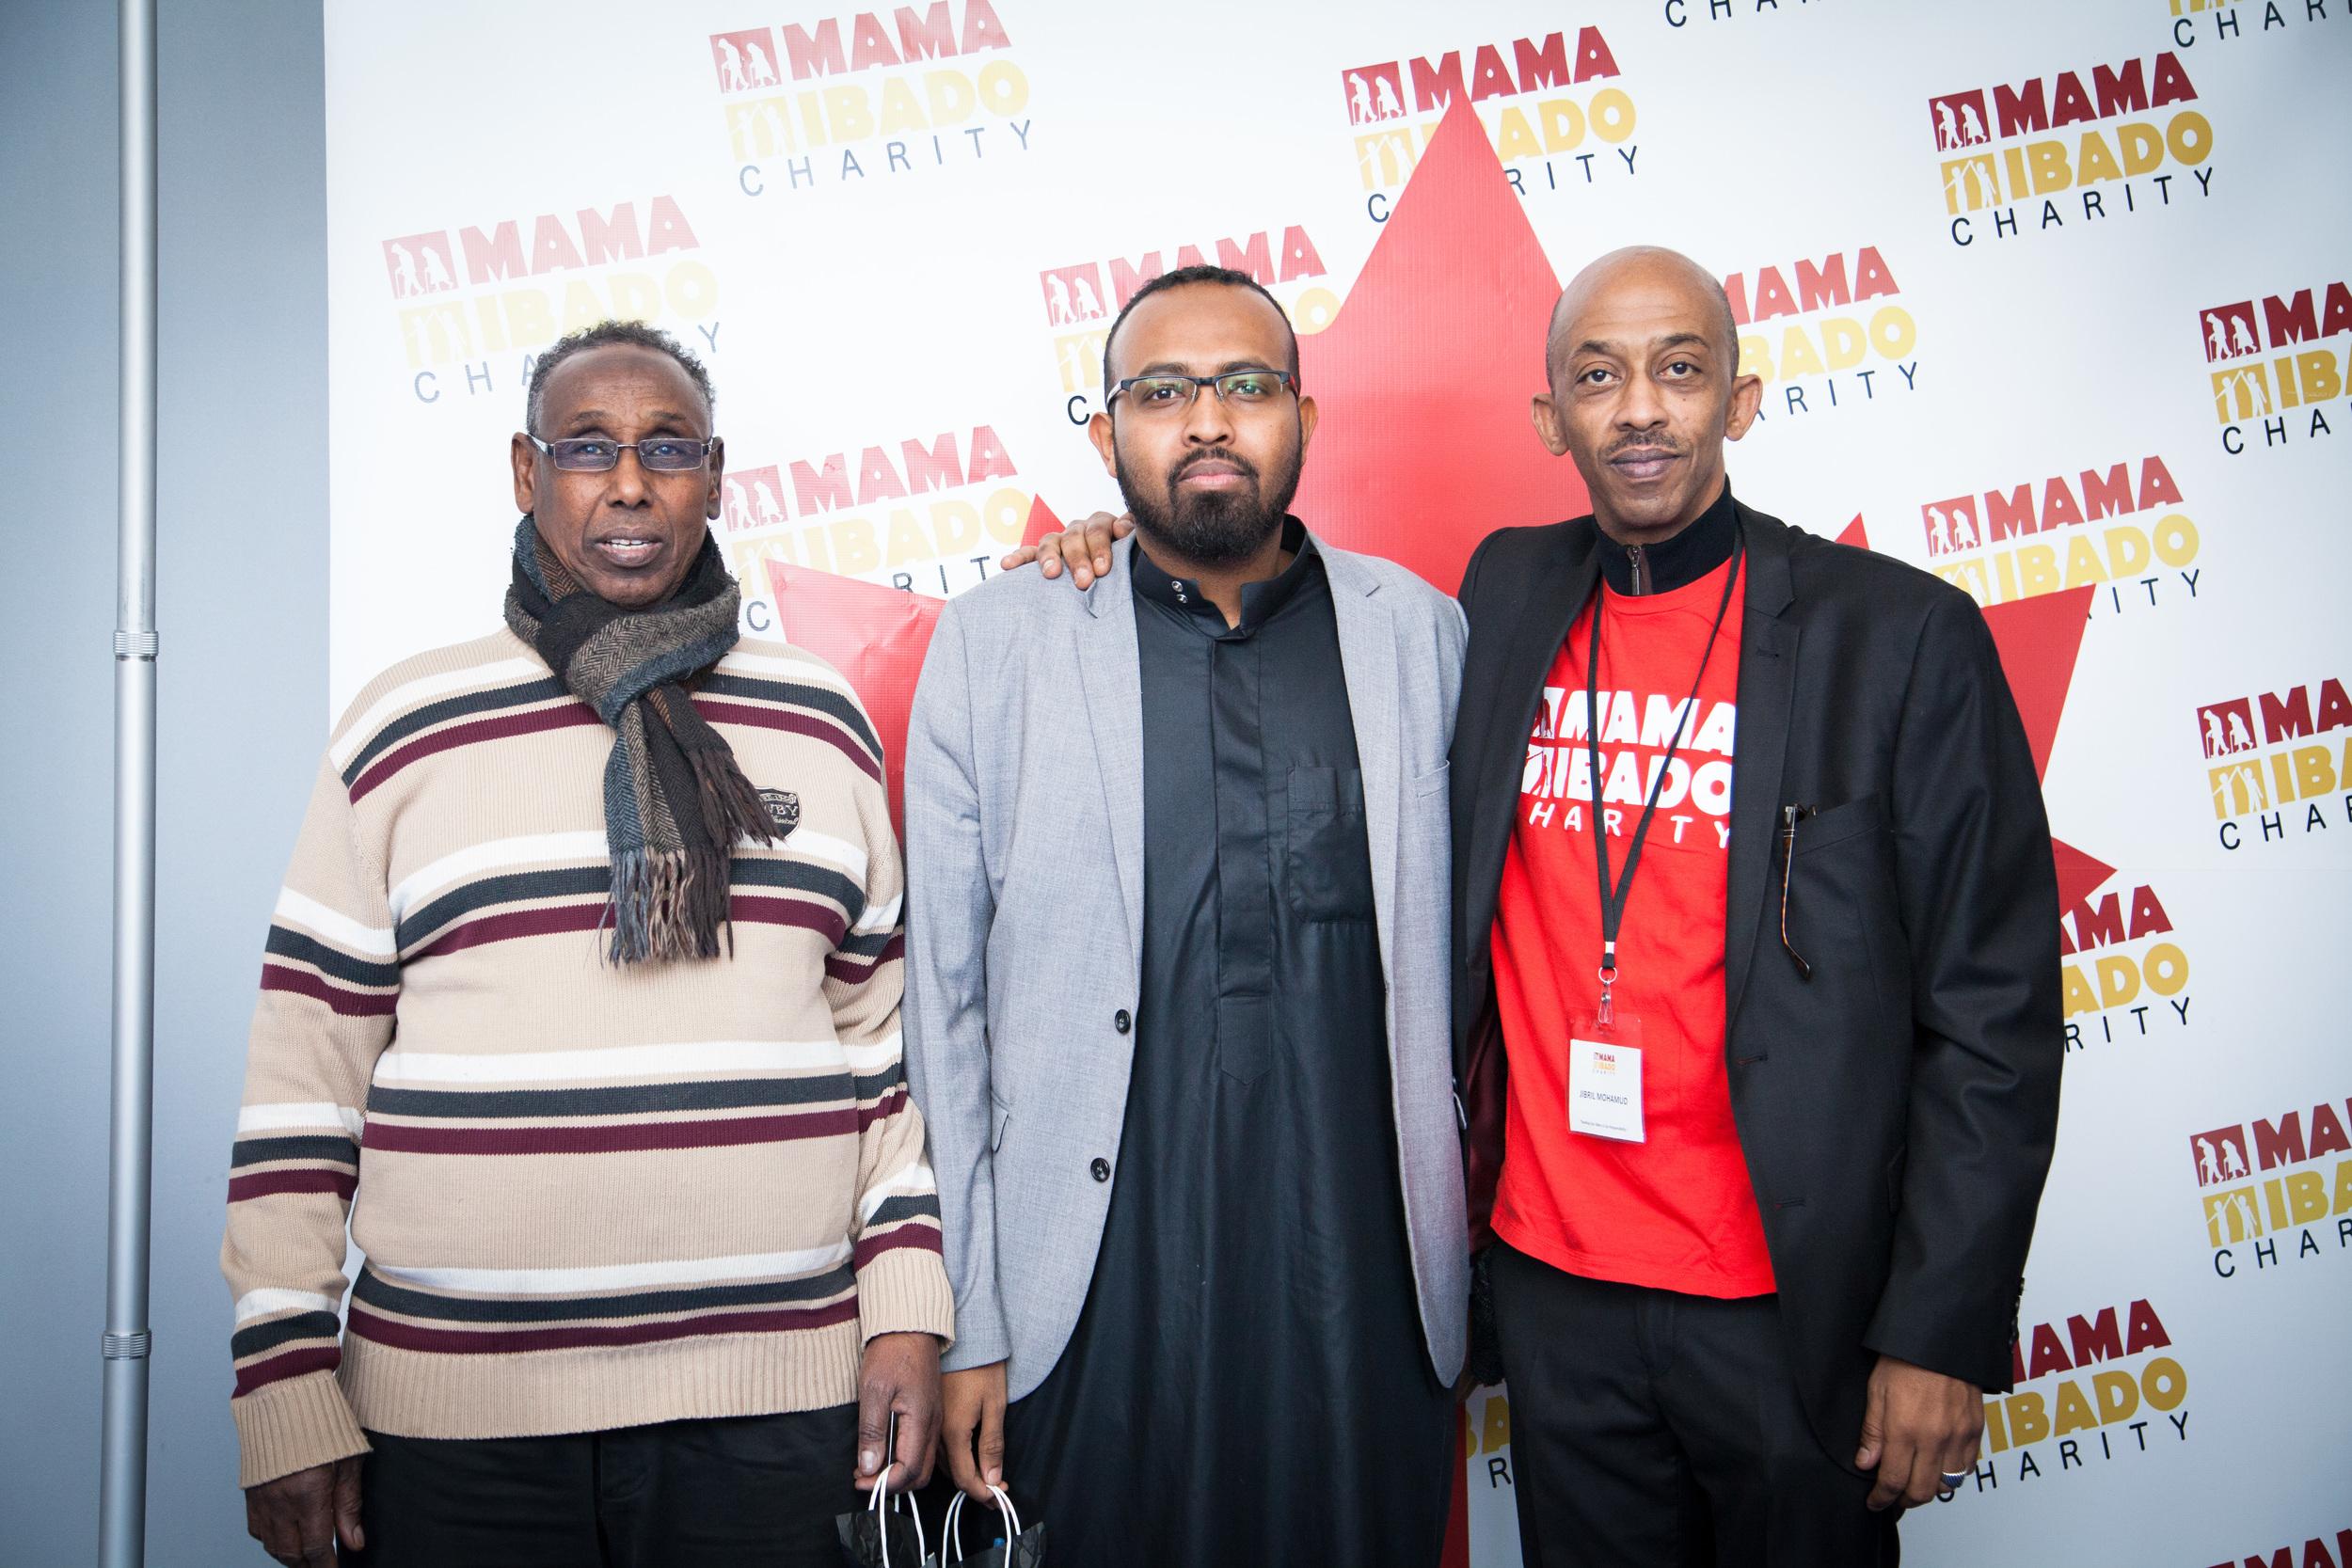 Mama Ibado Charity Launch 2016